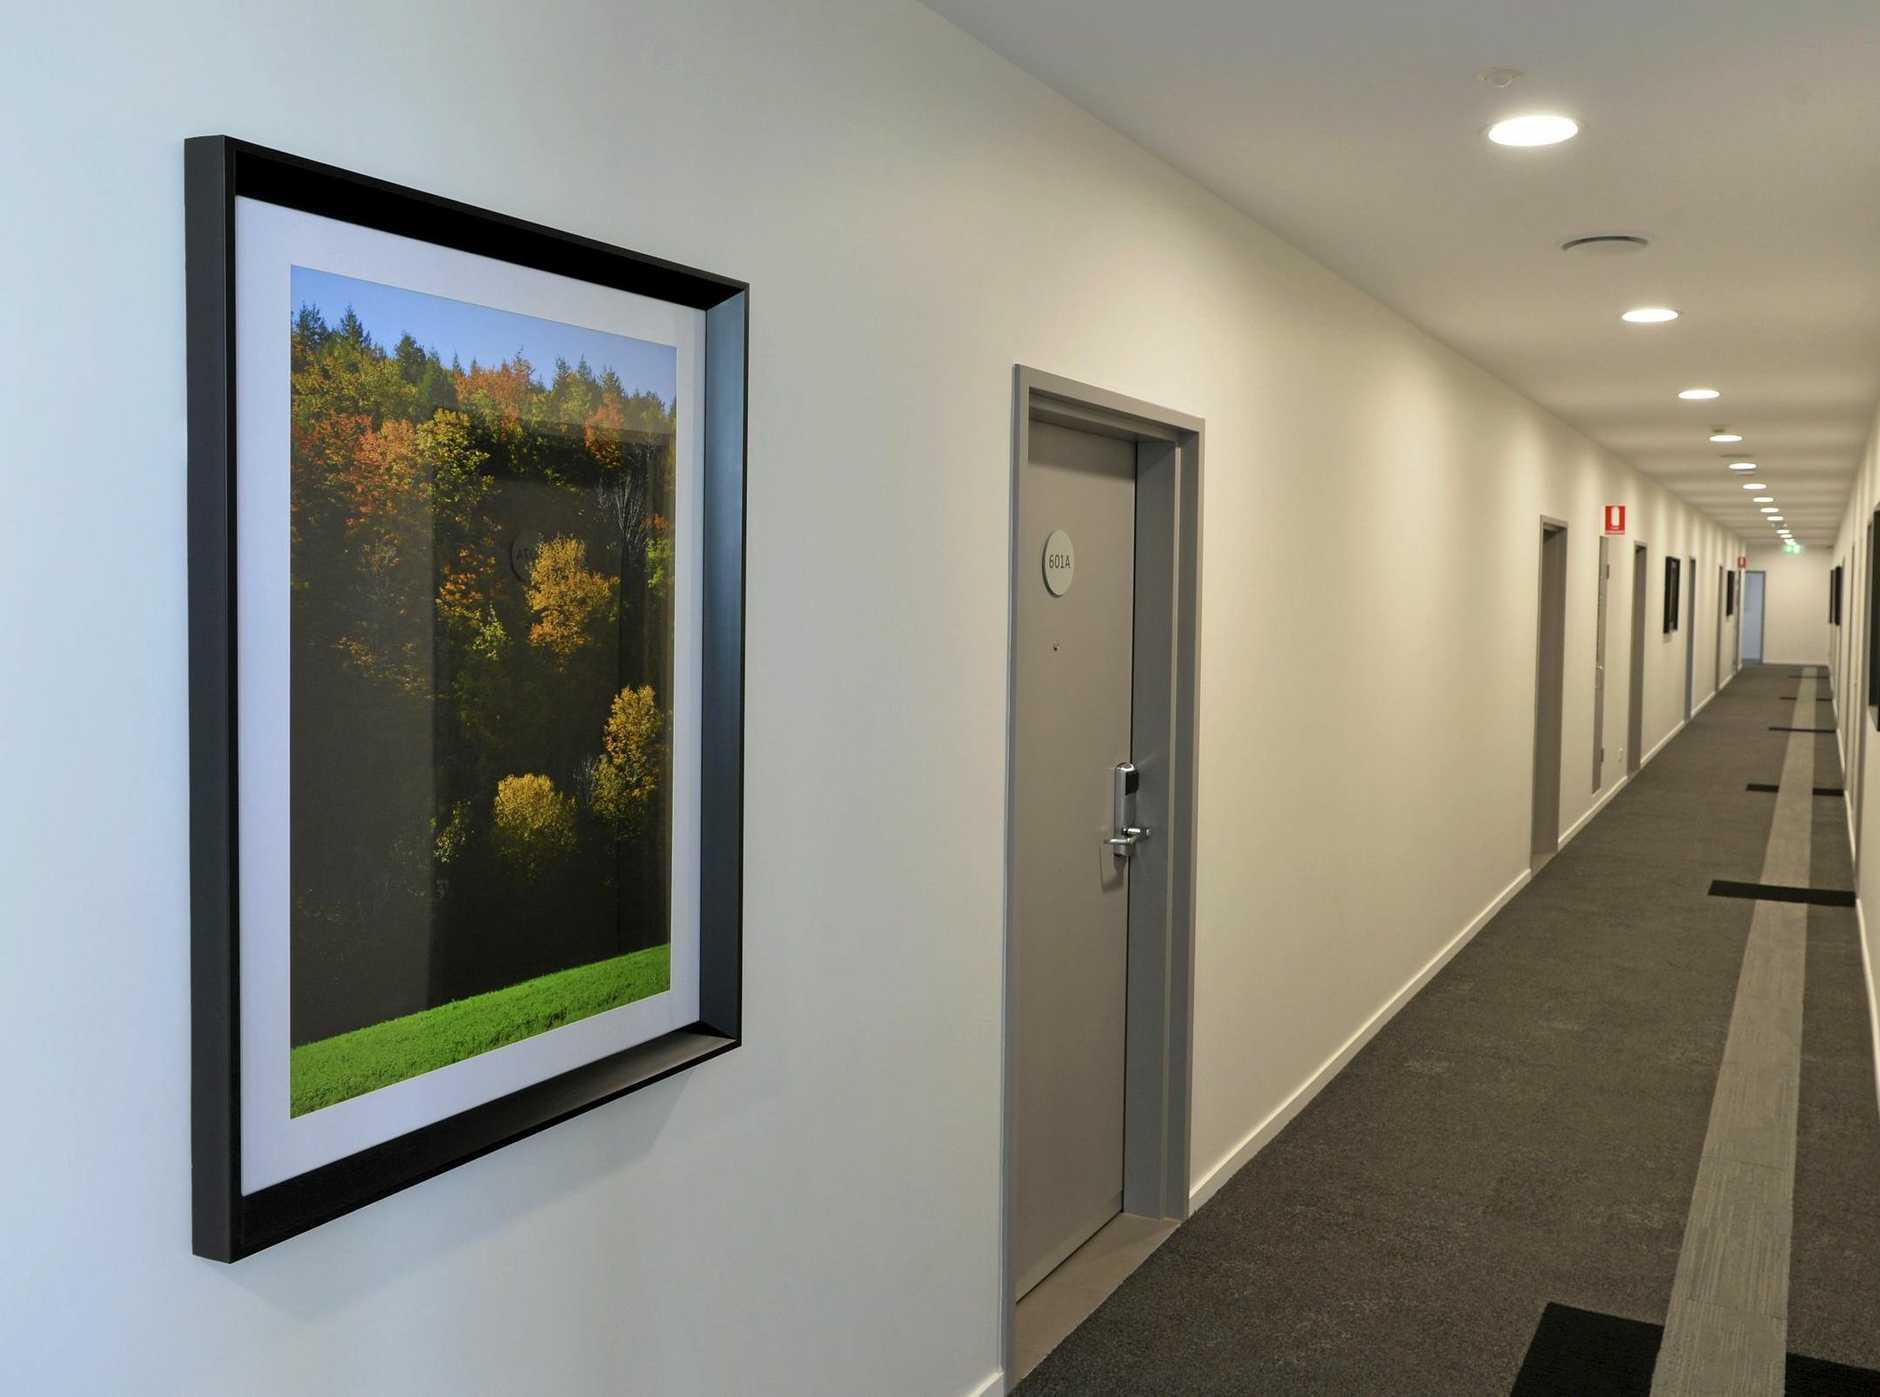 New carpets, paint and art adorns the hallways on each floor.